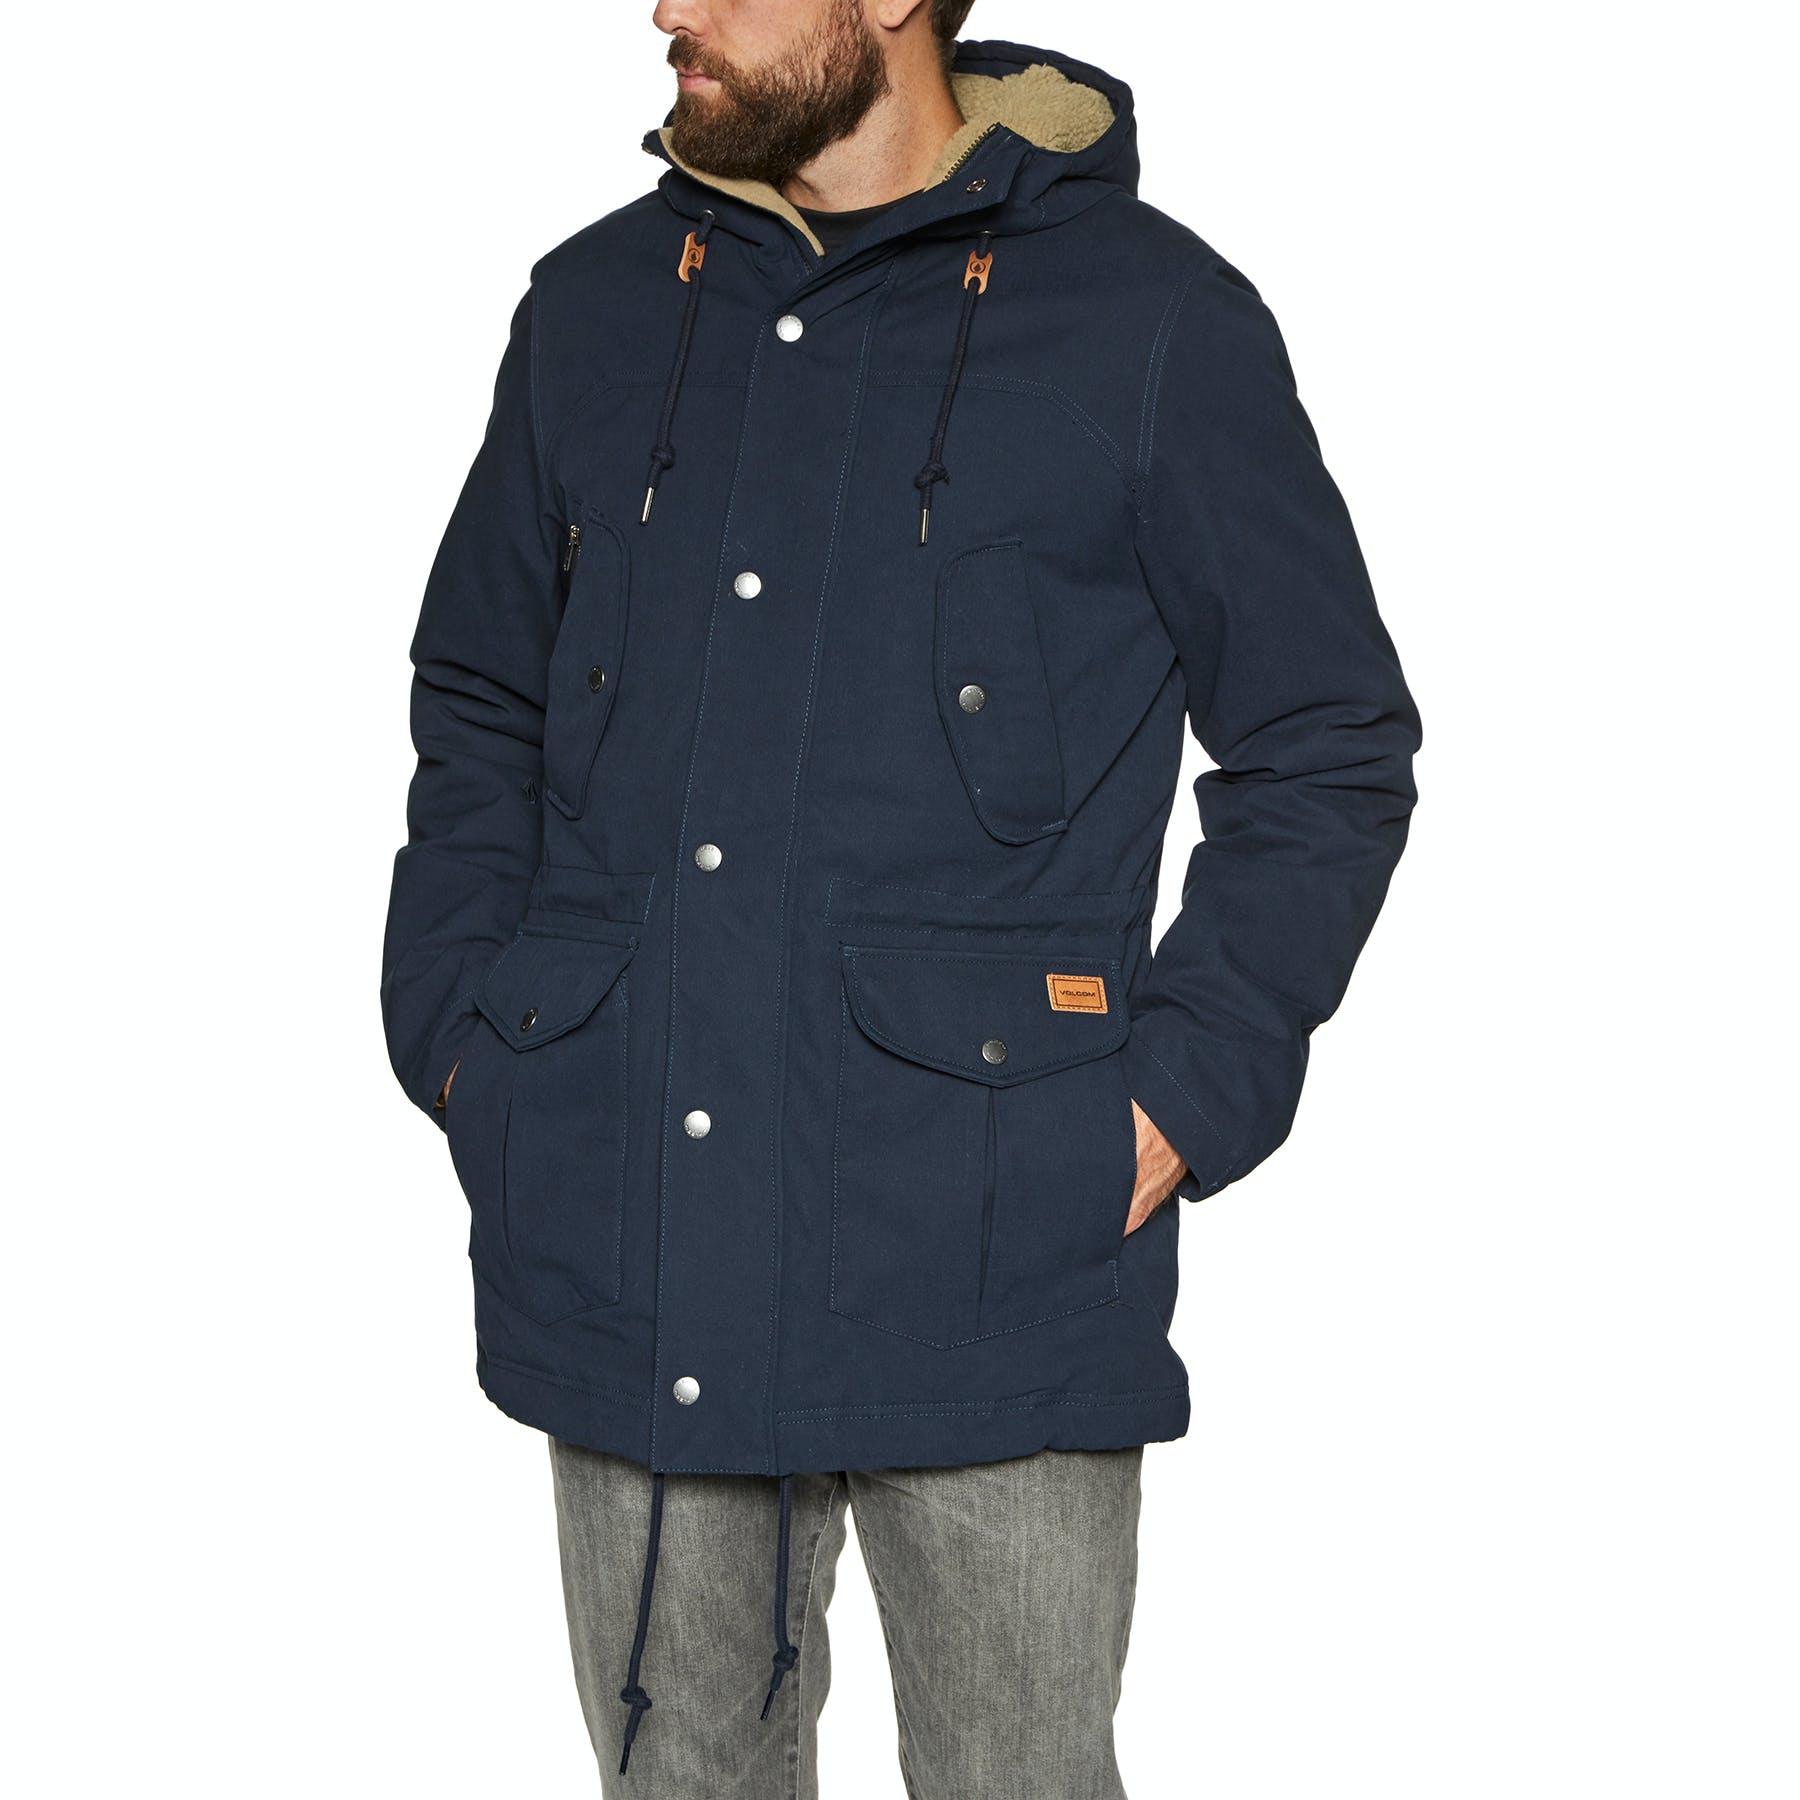 Volcom Starget 5k Parka Waterproof Jacket